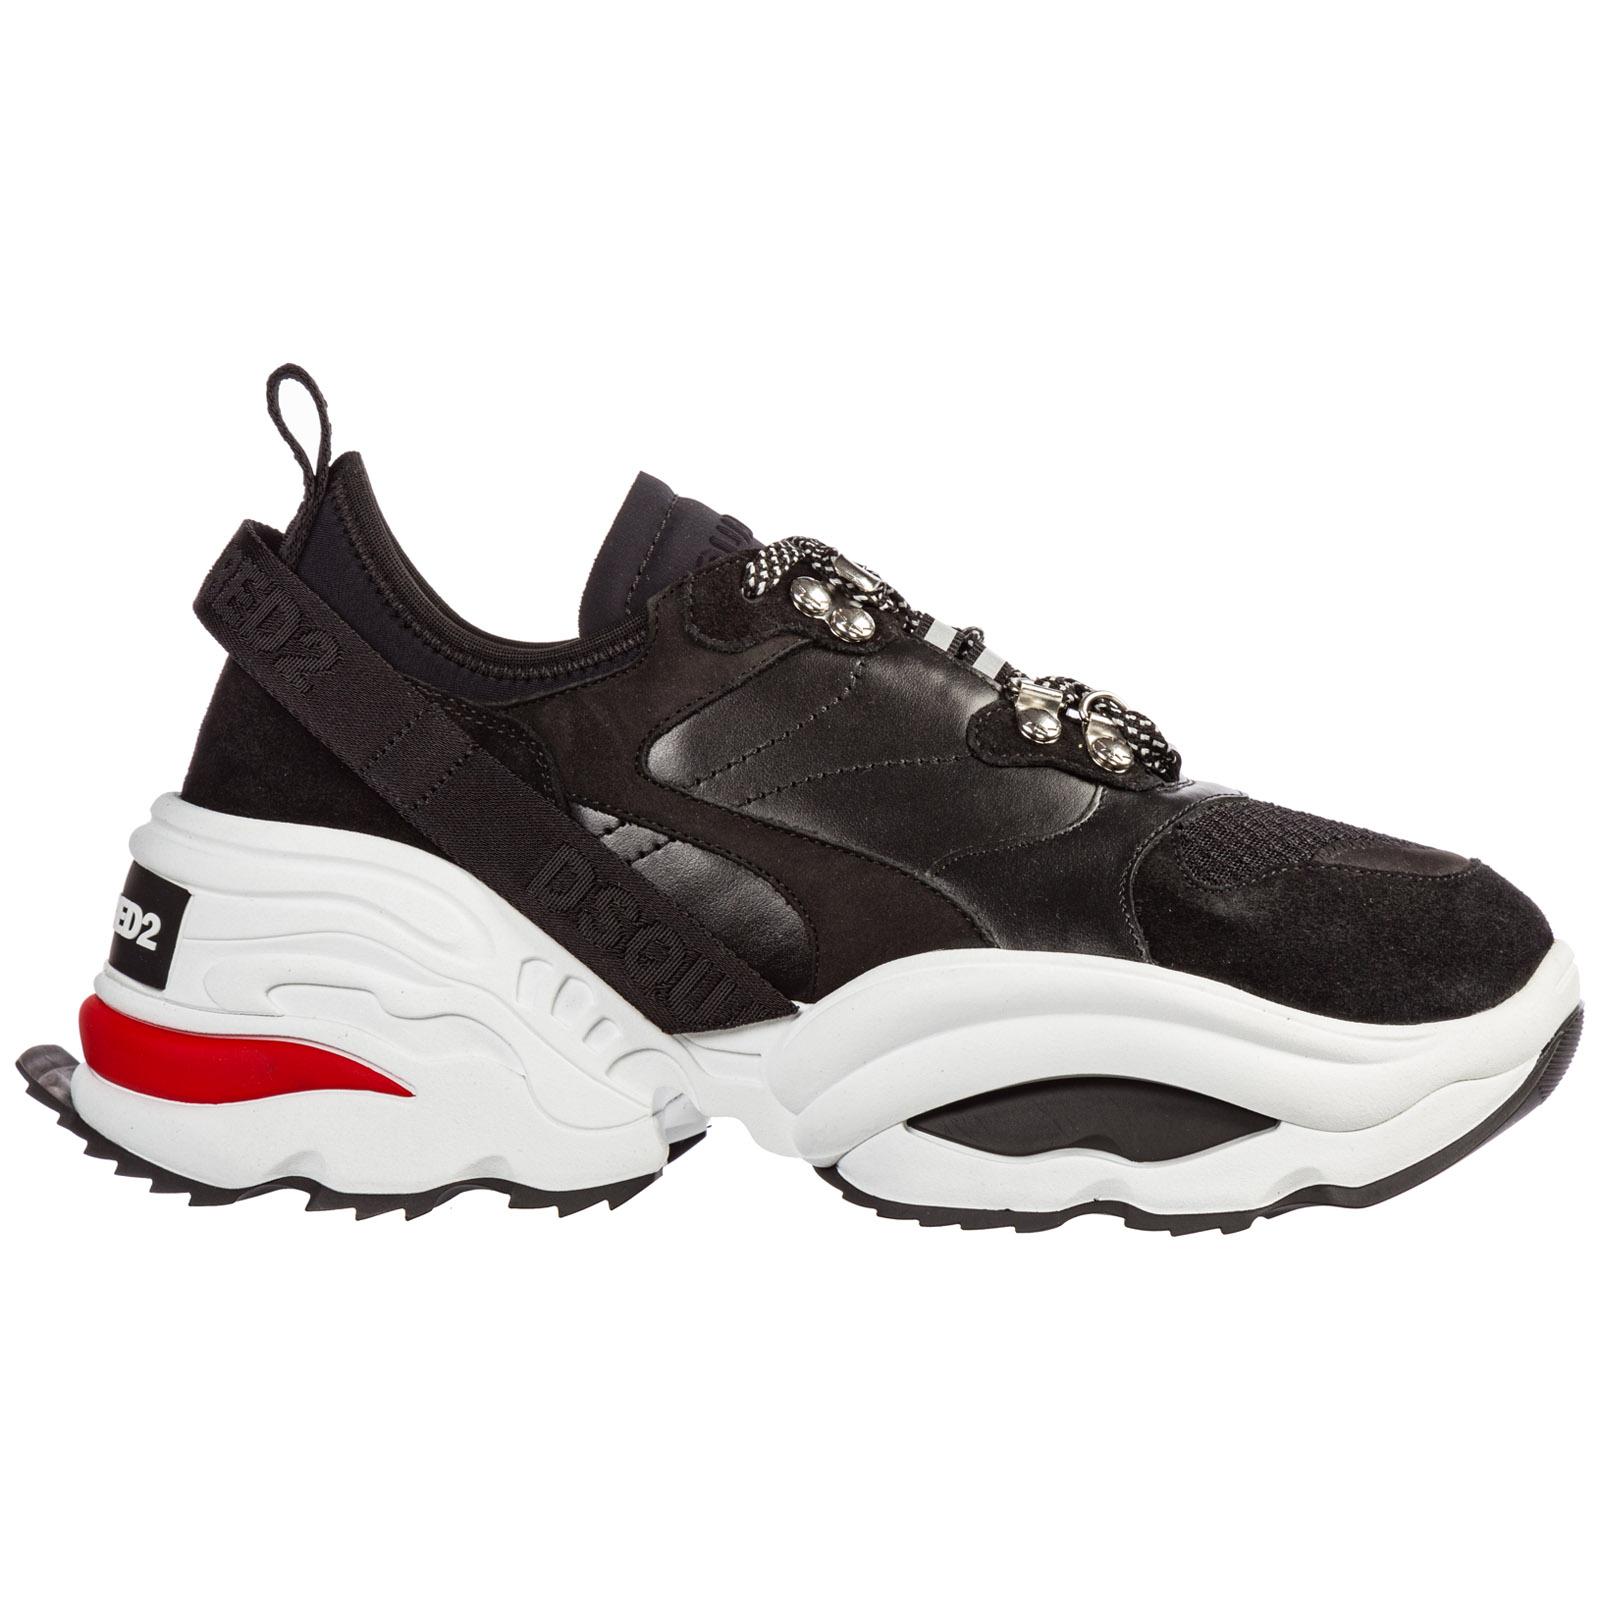 Herrenschuhe herren leder schuhe sneakers the giant